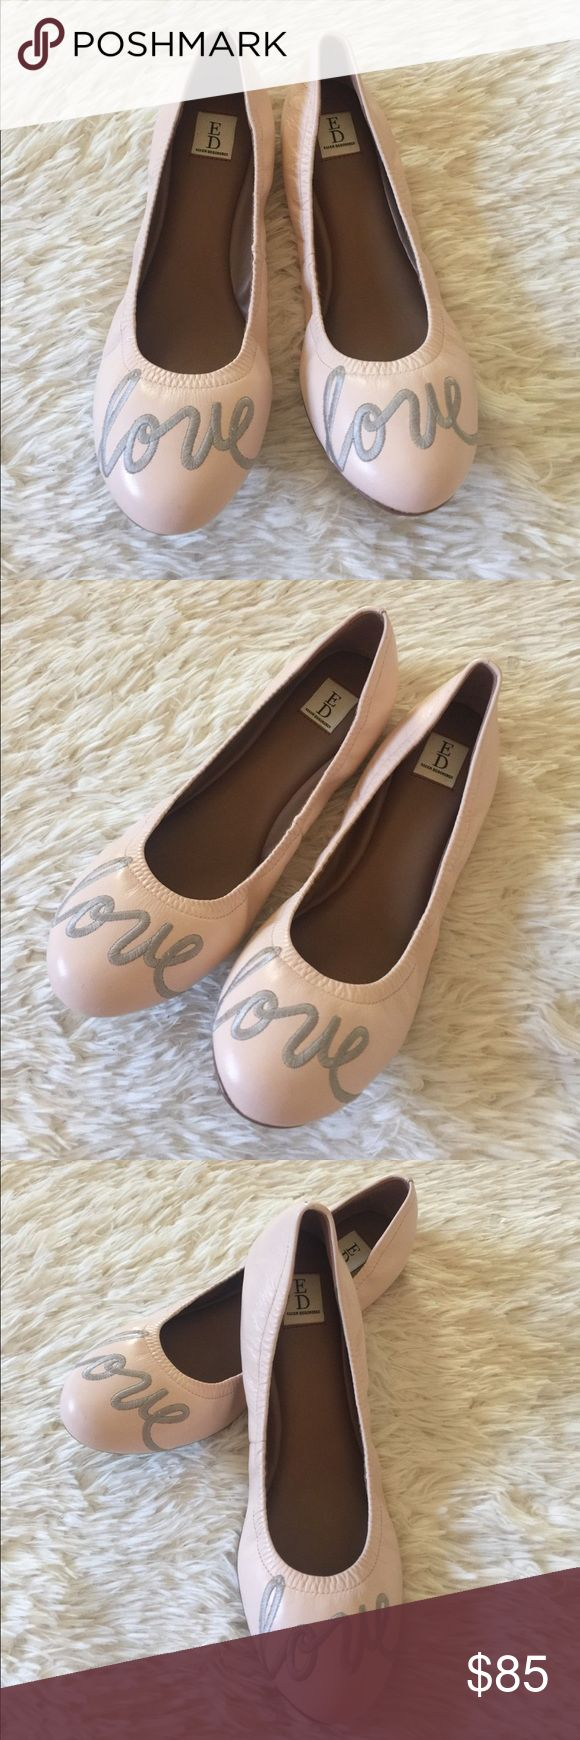 Ellen Degeneres Ballet Flat Brand new condition Super adorable in love Ellen Degeneres Ballet Flat ❌Trade Nordstrom Shoes Flats & Loafers